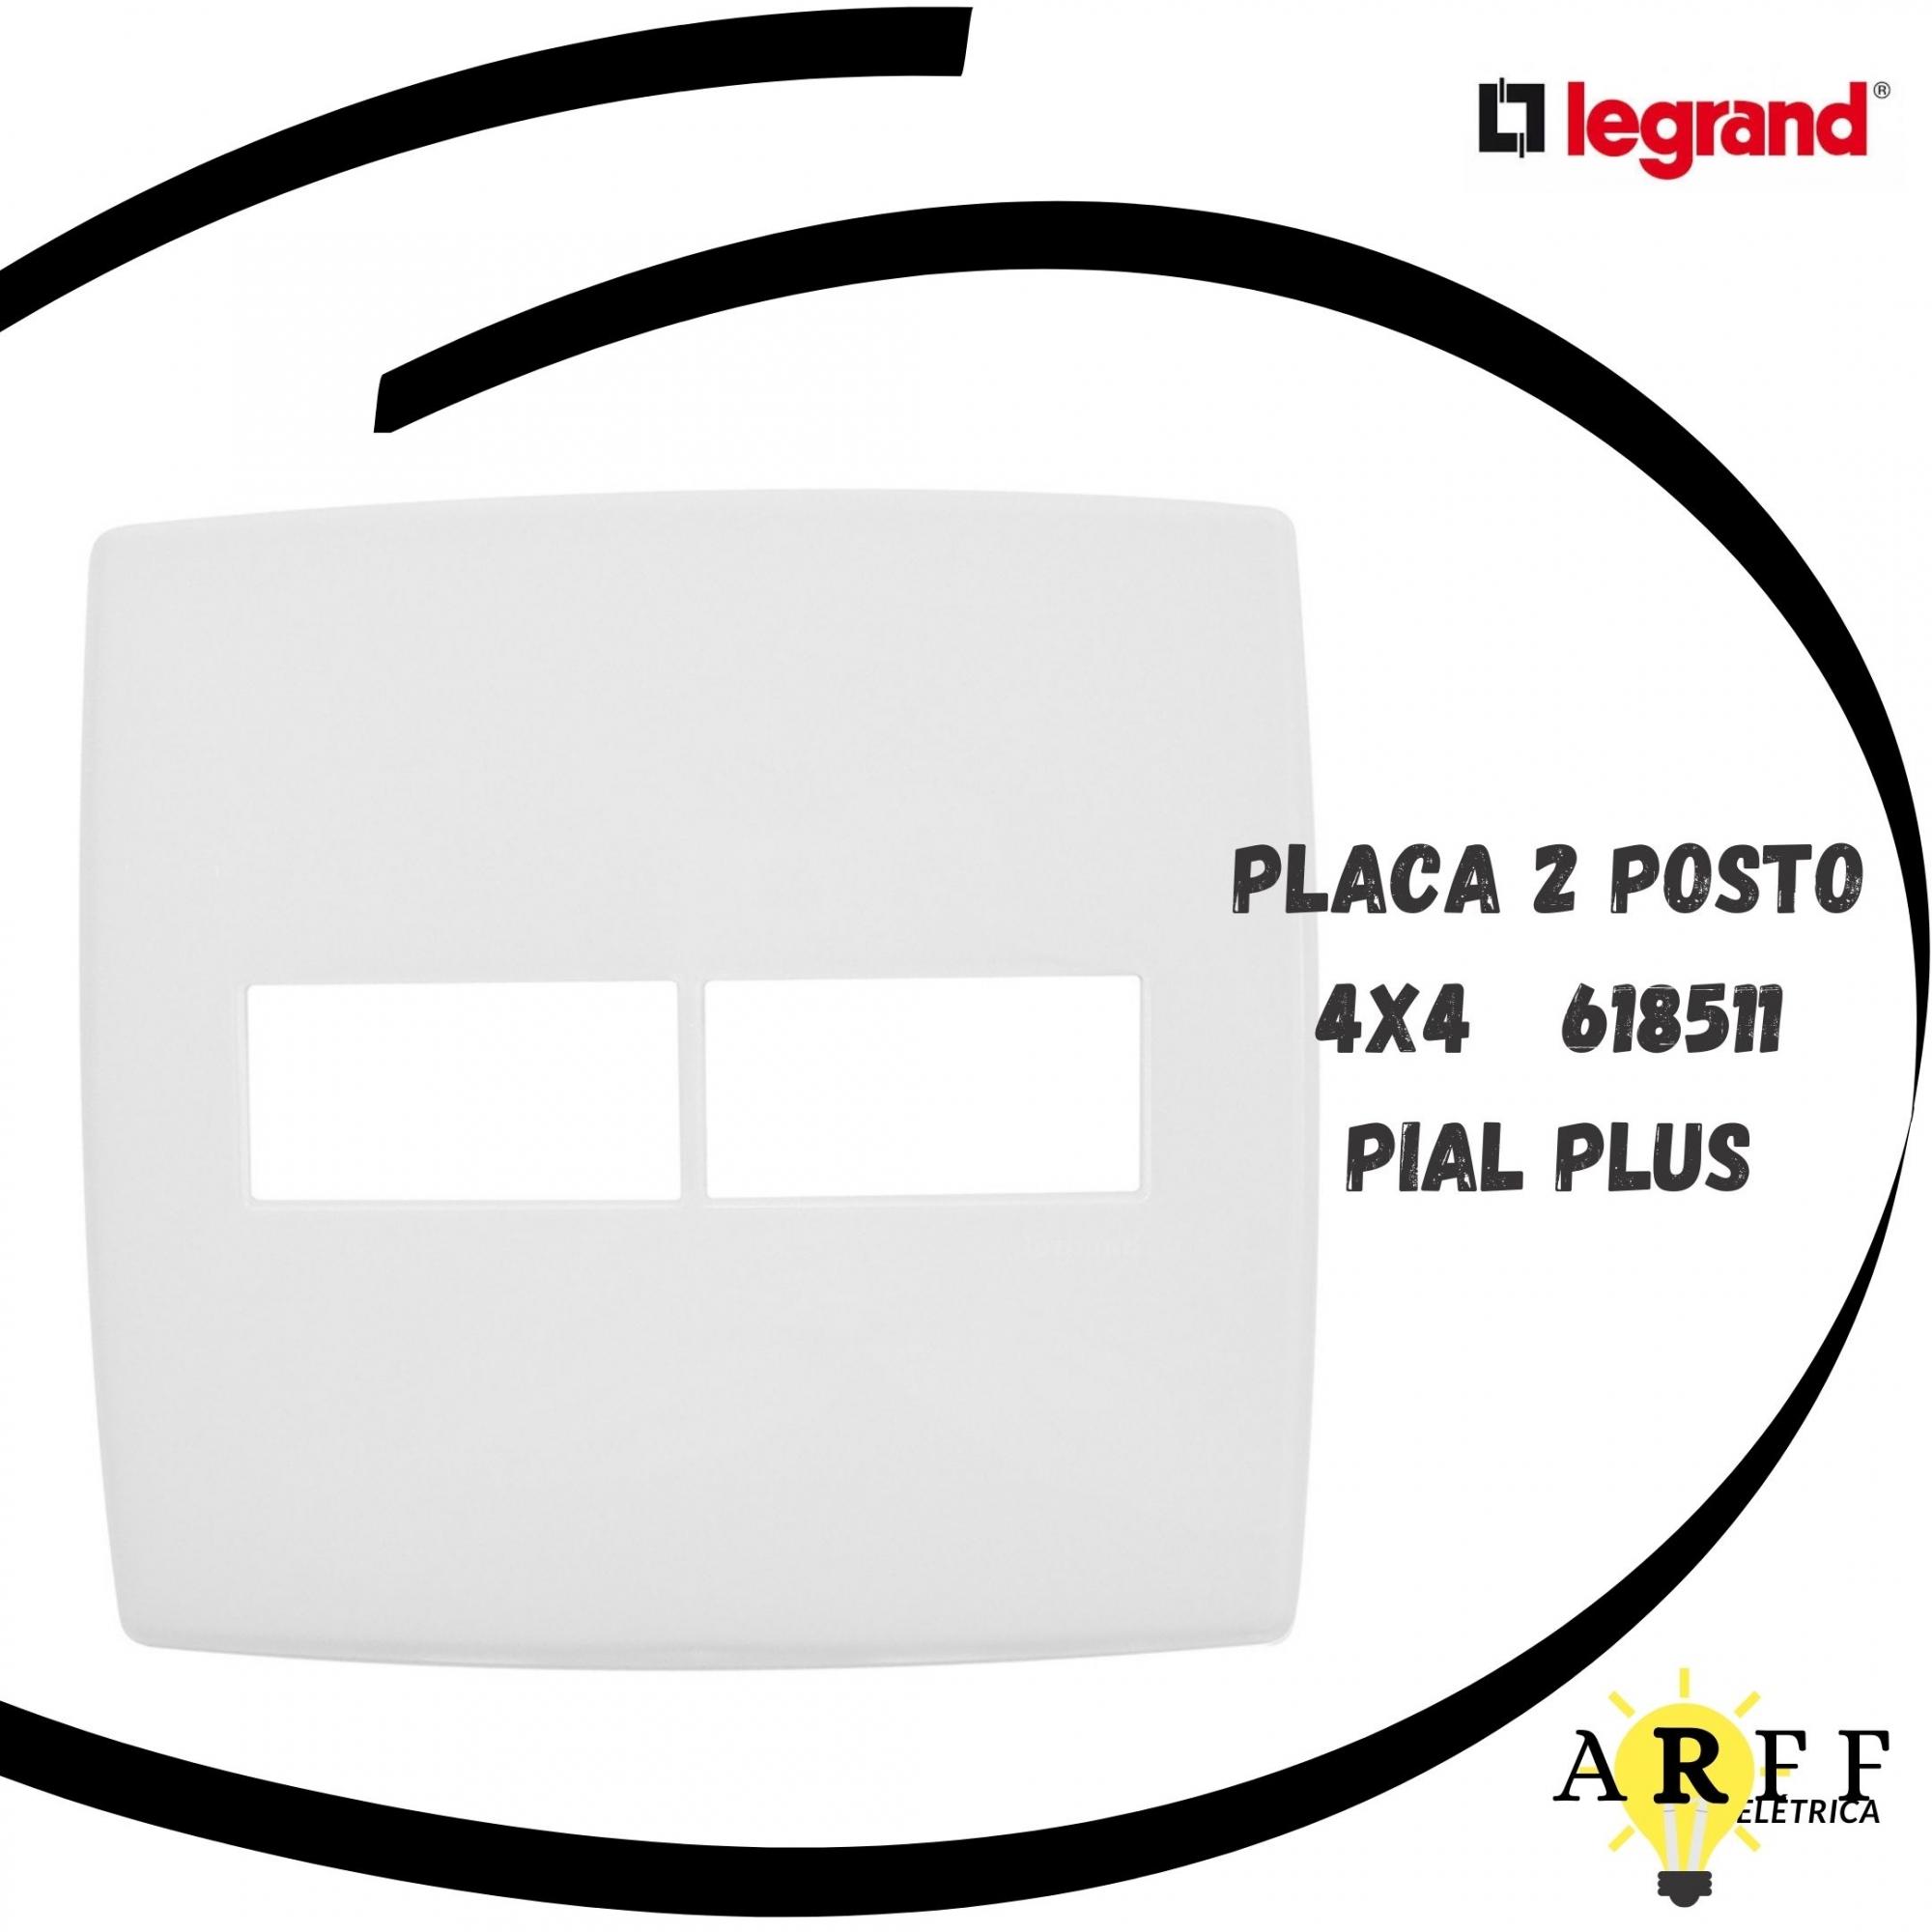 618511 Placa 2 Posto Sep 4x4 PIAL PLUS LEGRAND